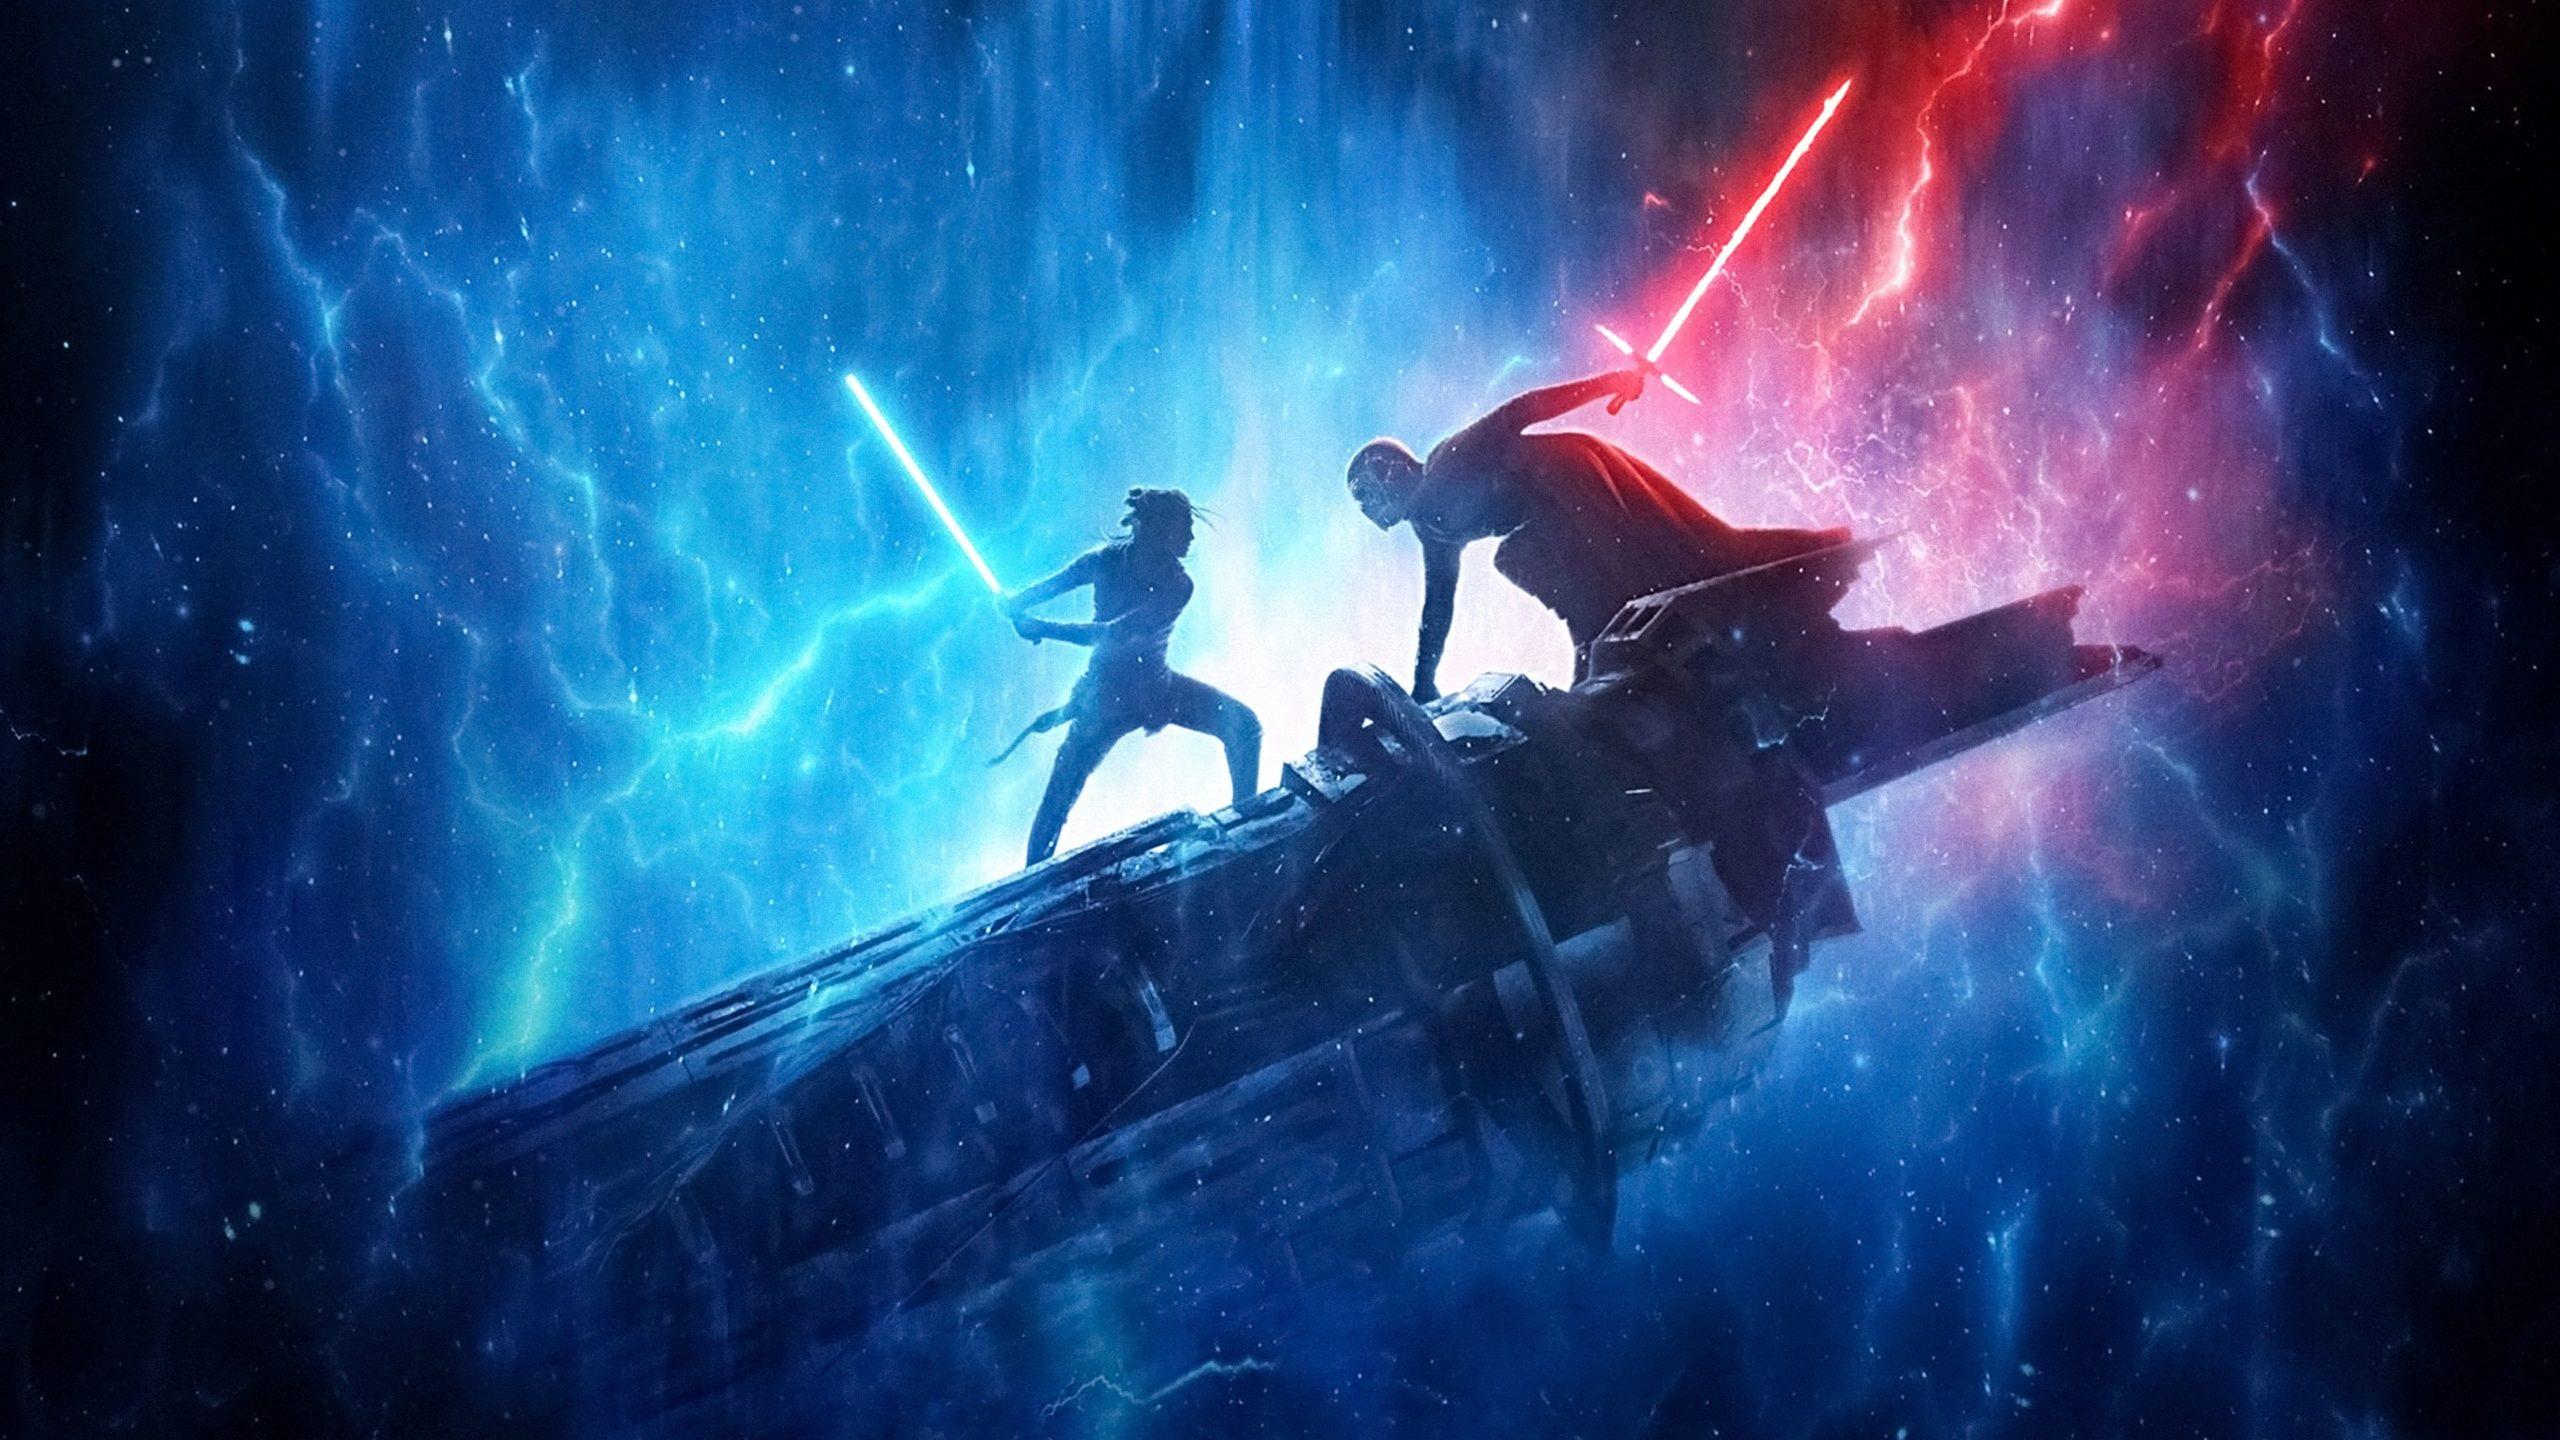 Regarder Star Wars, épisode IX en streaming gratuit